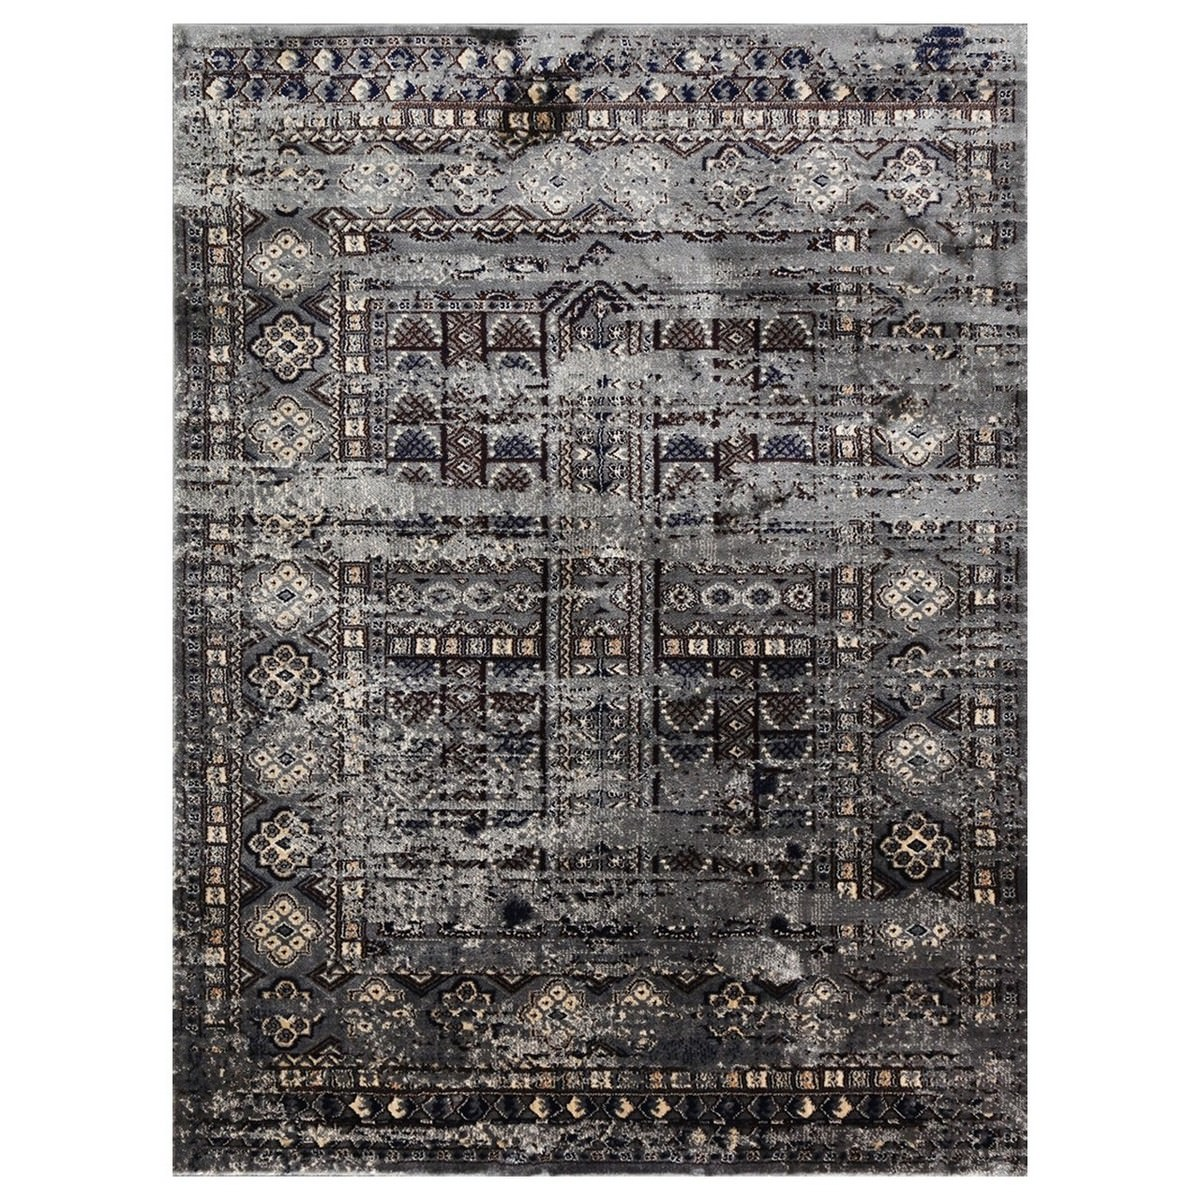 Artifact Ziba Distressed Oriental Rug, 80x150cm